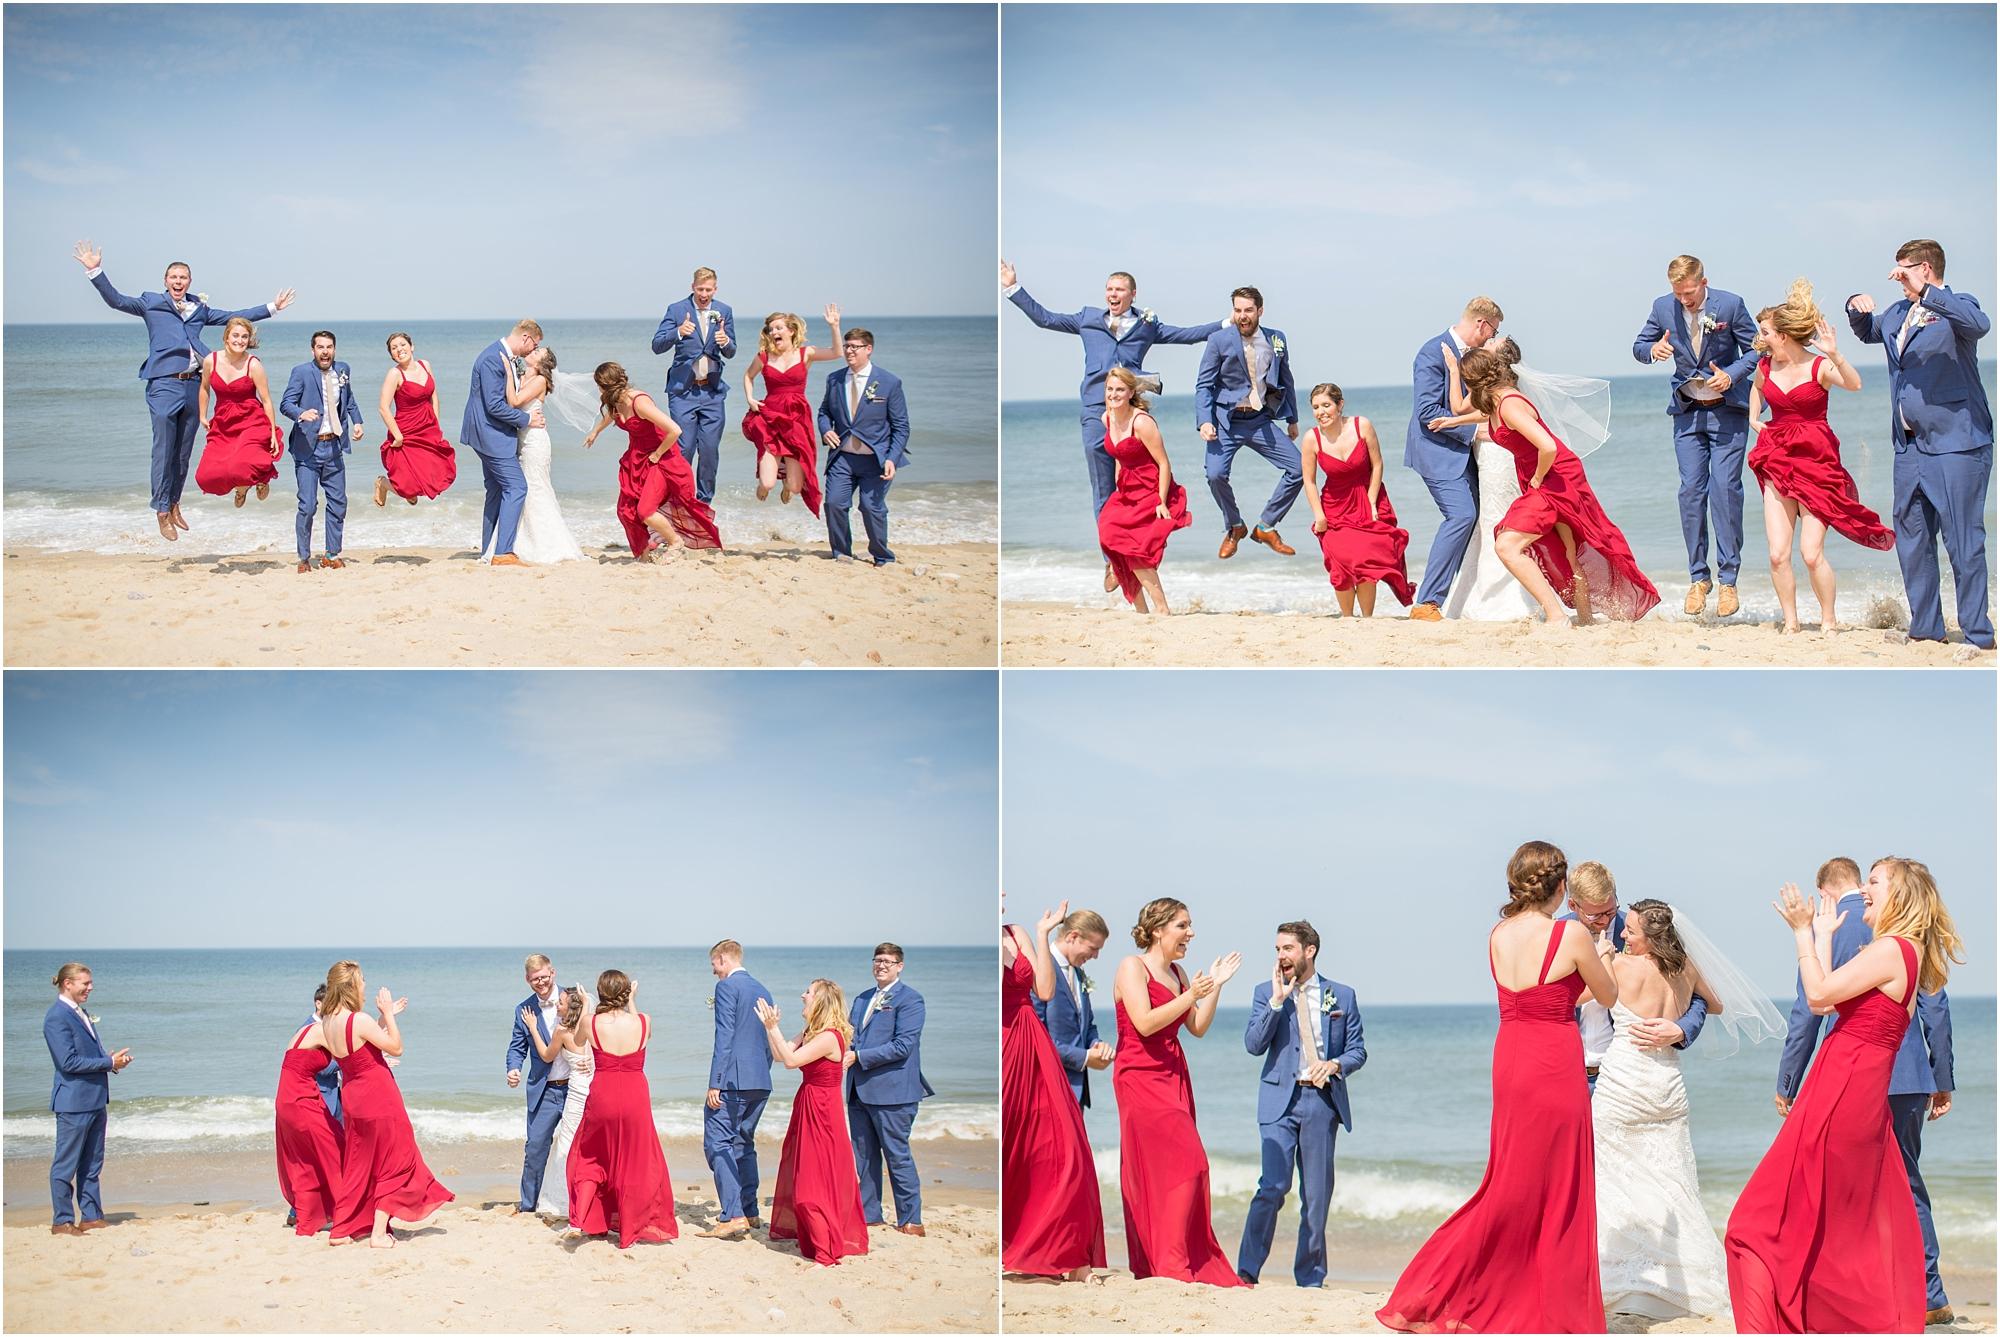 Goodman 4-Bridal Party-417_anna grace photography wellfleet cape cod massachusetts destination wedding photographer Chequessett Yacht and Country Club wedding photo.jpg